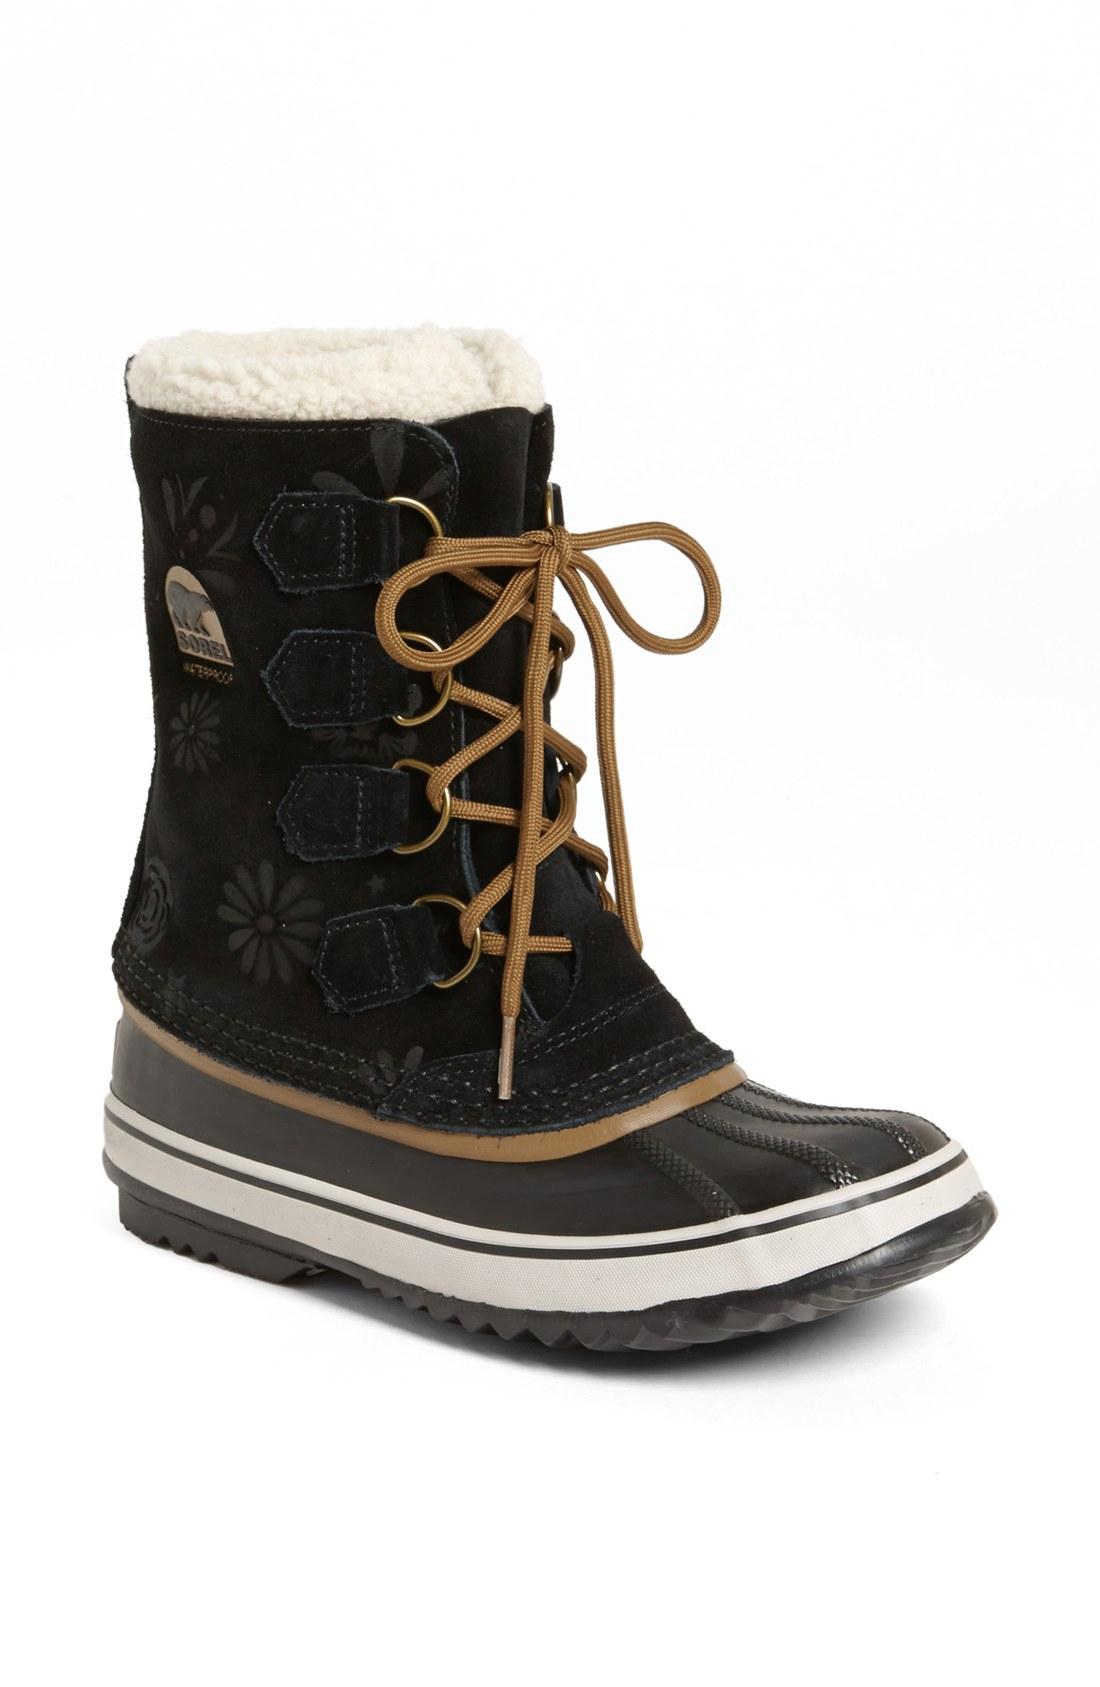 Sorel Short Snow Boots | Santa Barbara Institute for Consciousness ...